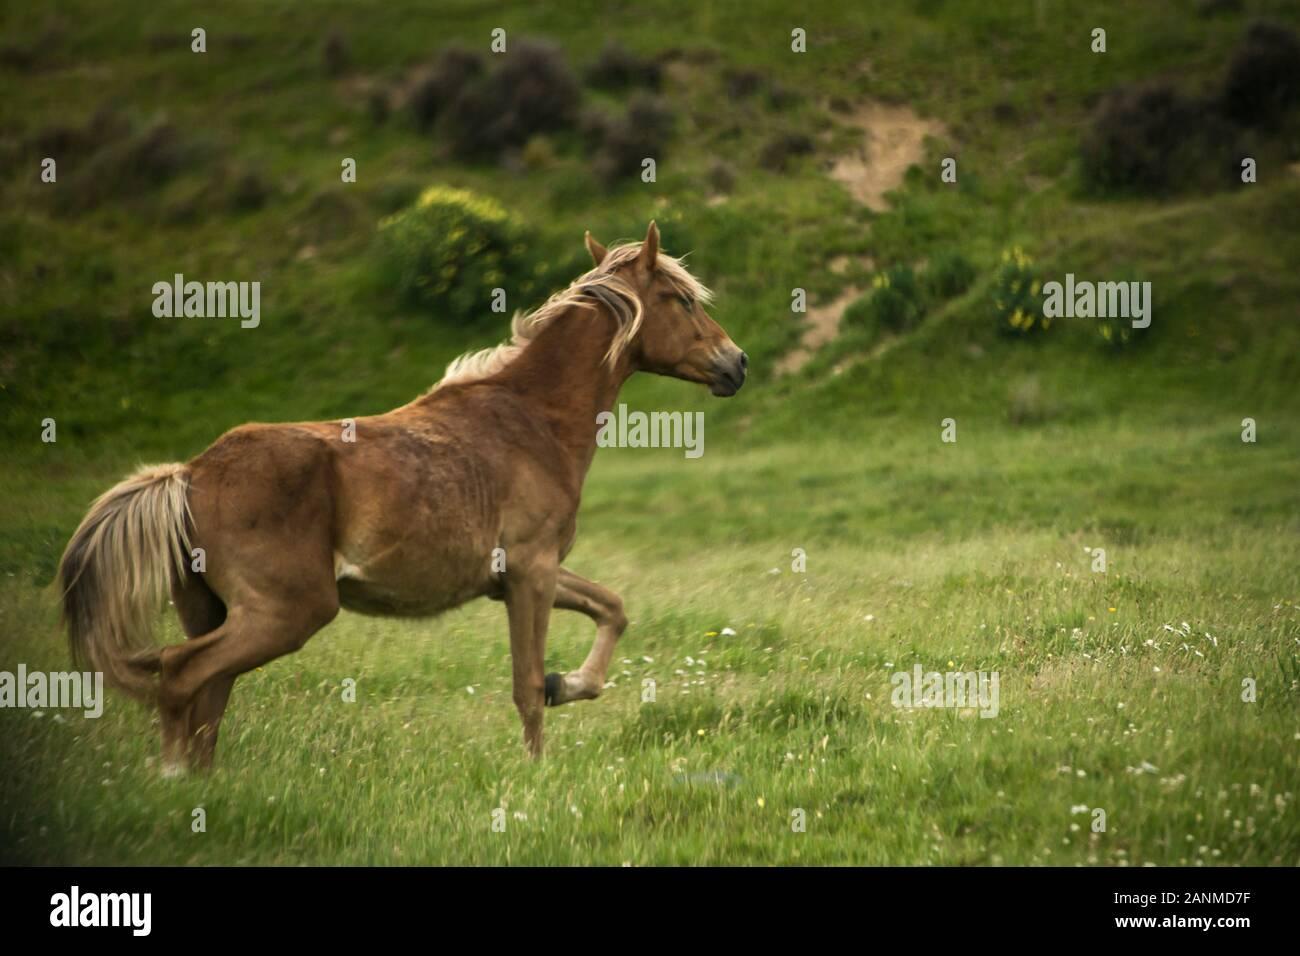 Wild Horse Running In Kaimanawa Mountain Range Central Plateau New Zealand Stock Photo Alamy